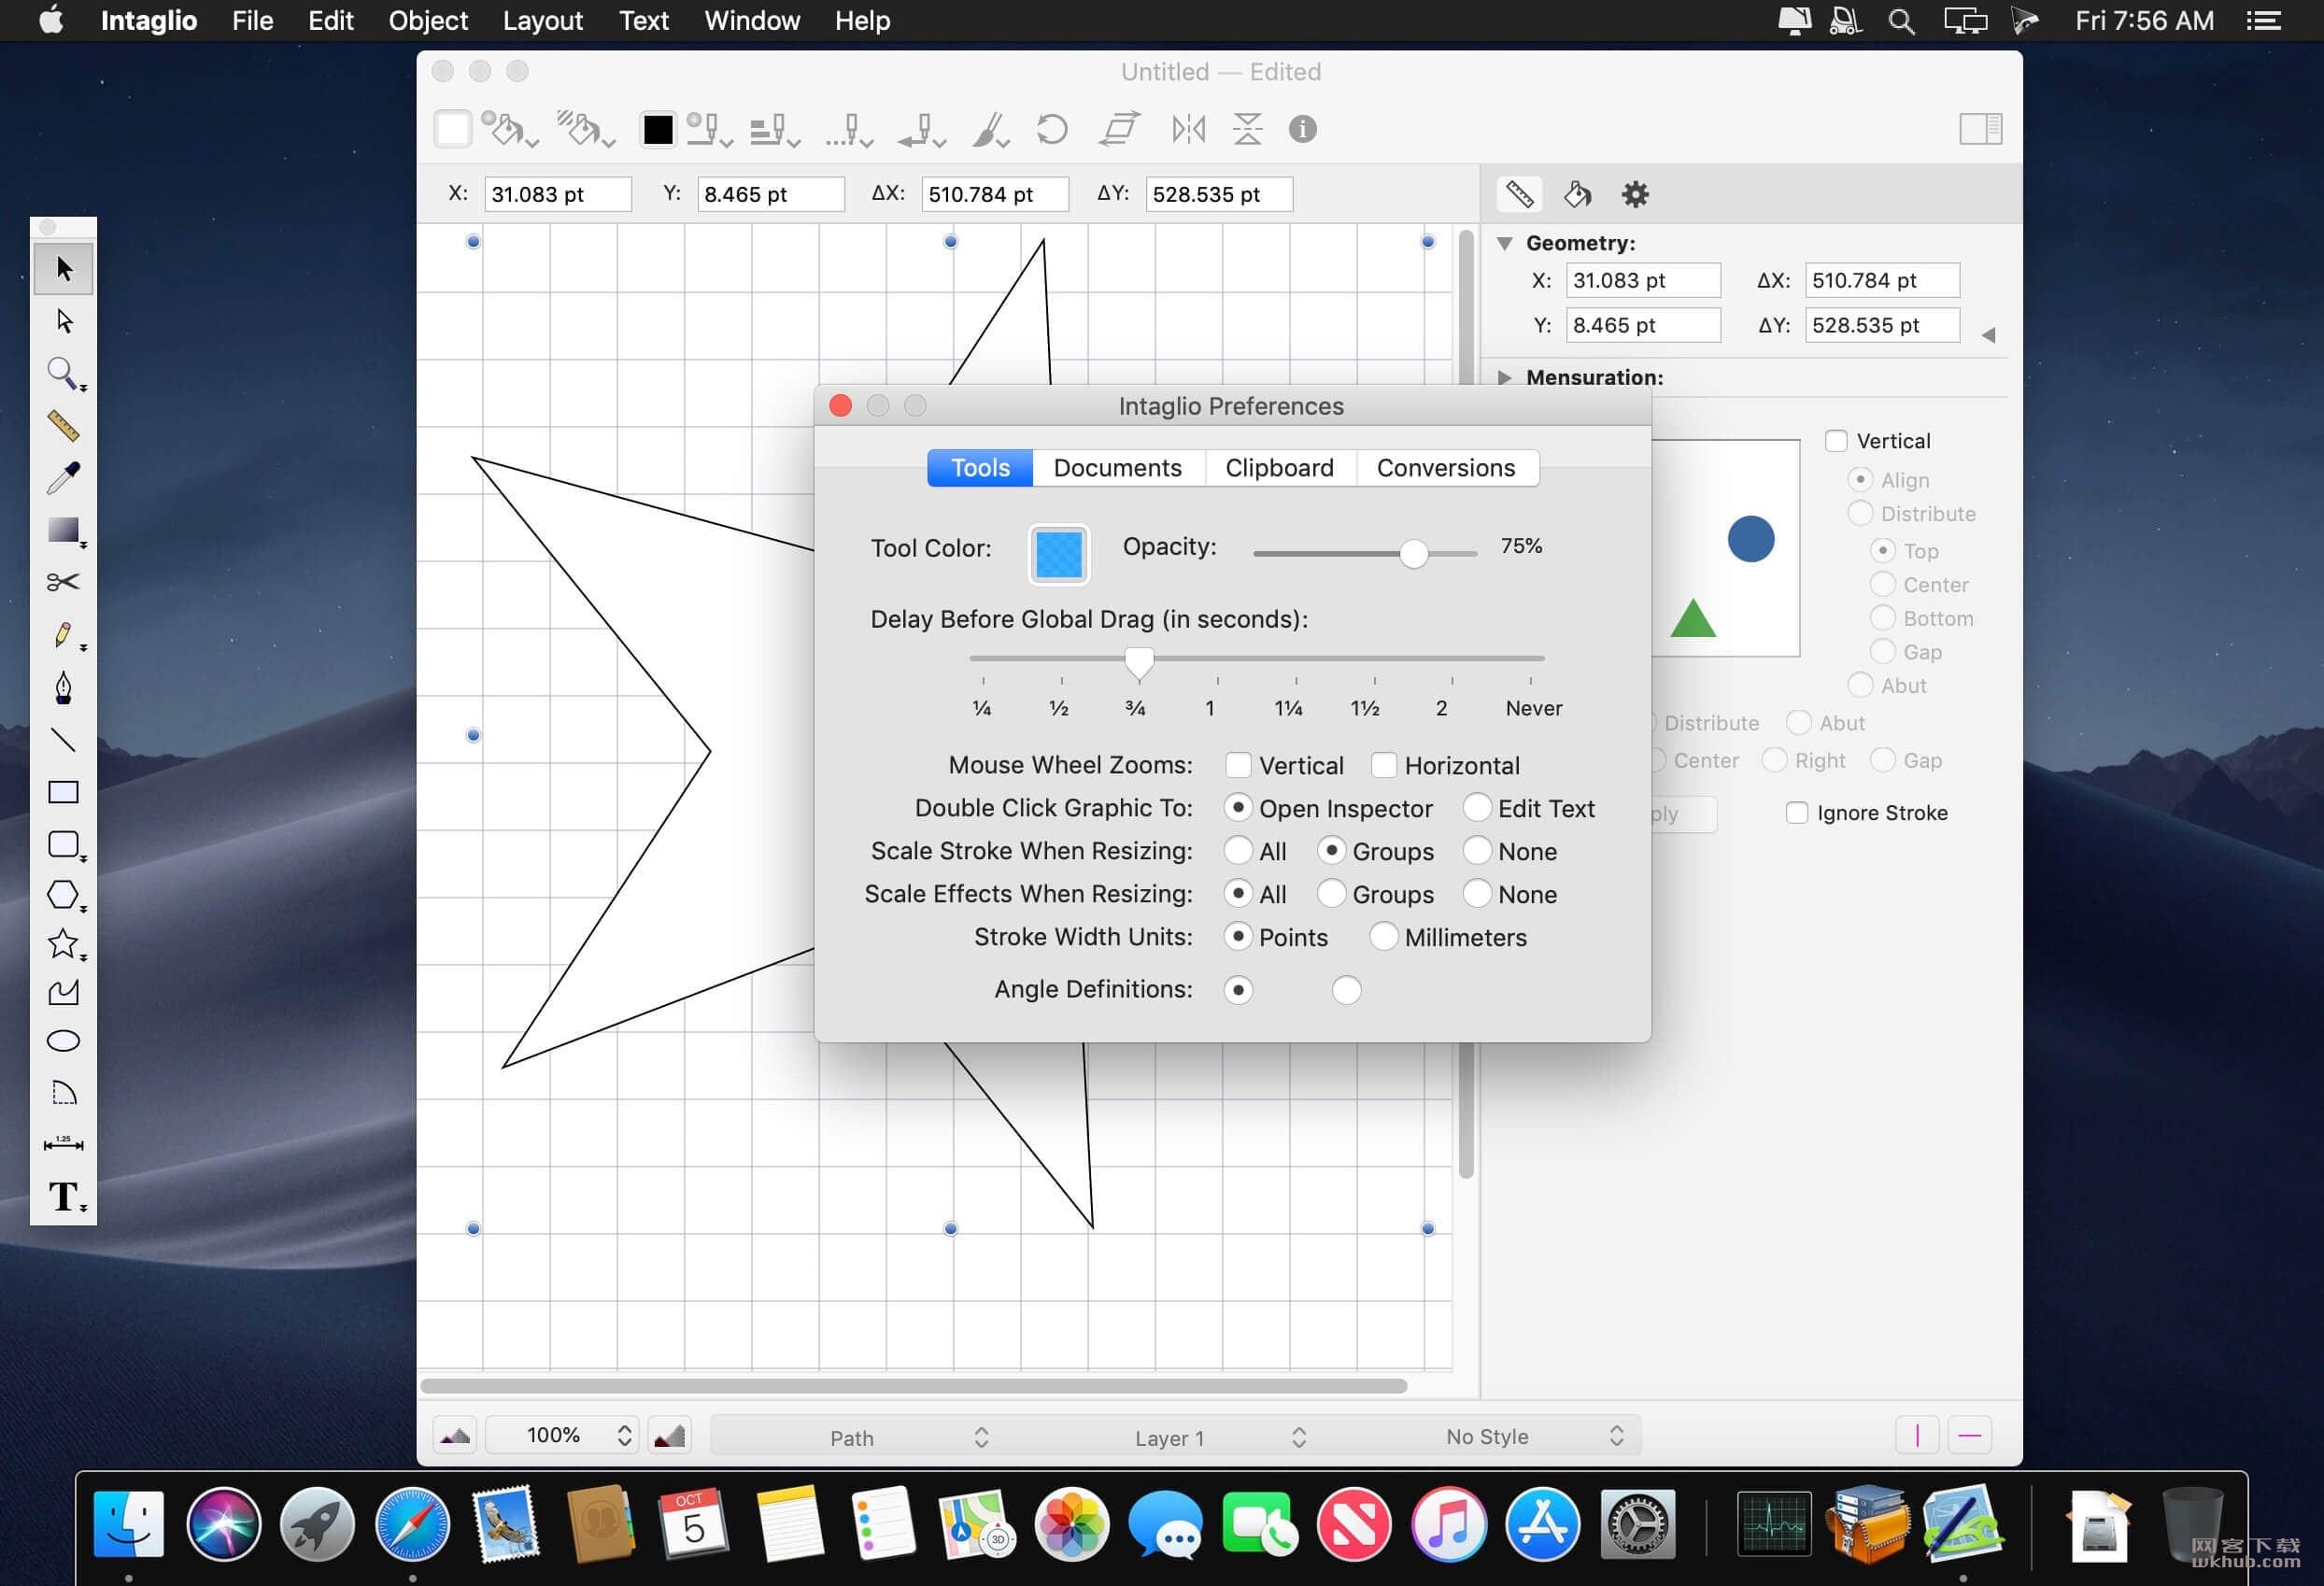 Intaglio 3.9.5 易用的绘图软件